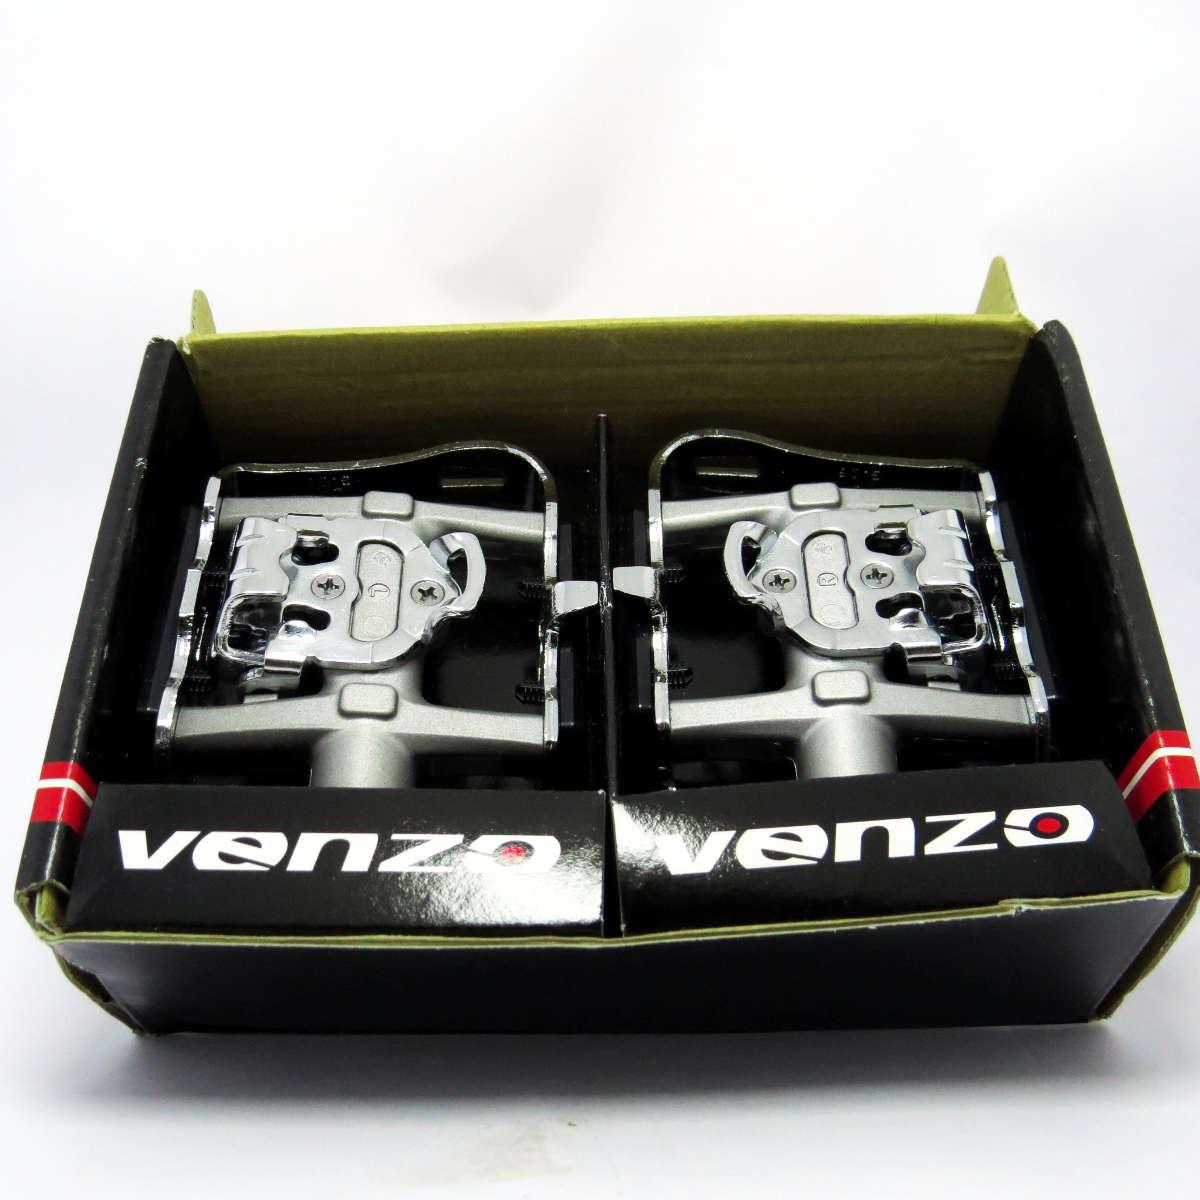 Pedal Venzo Mlx Mtb Clip